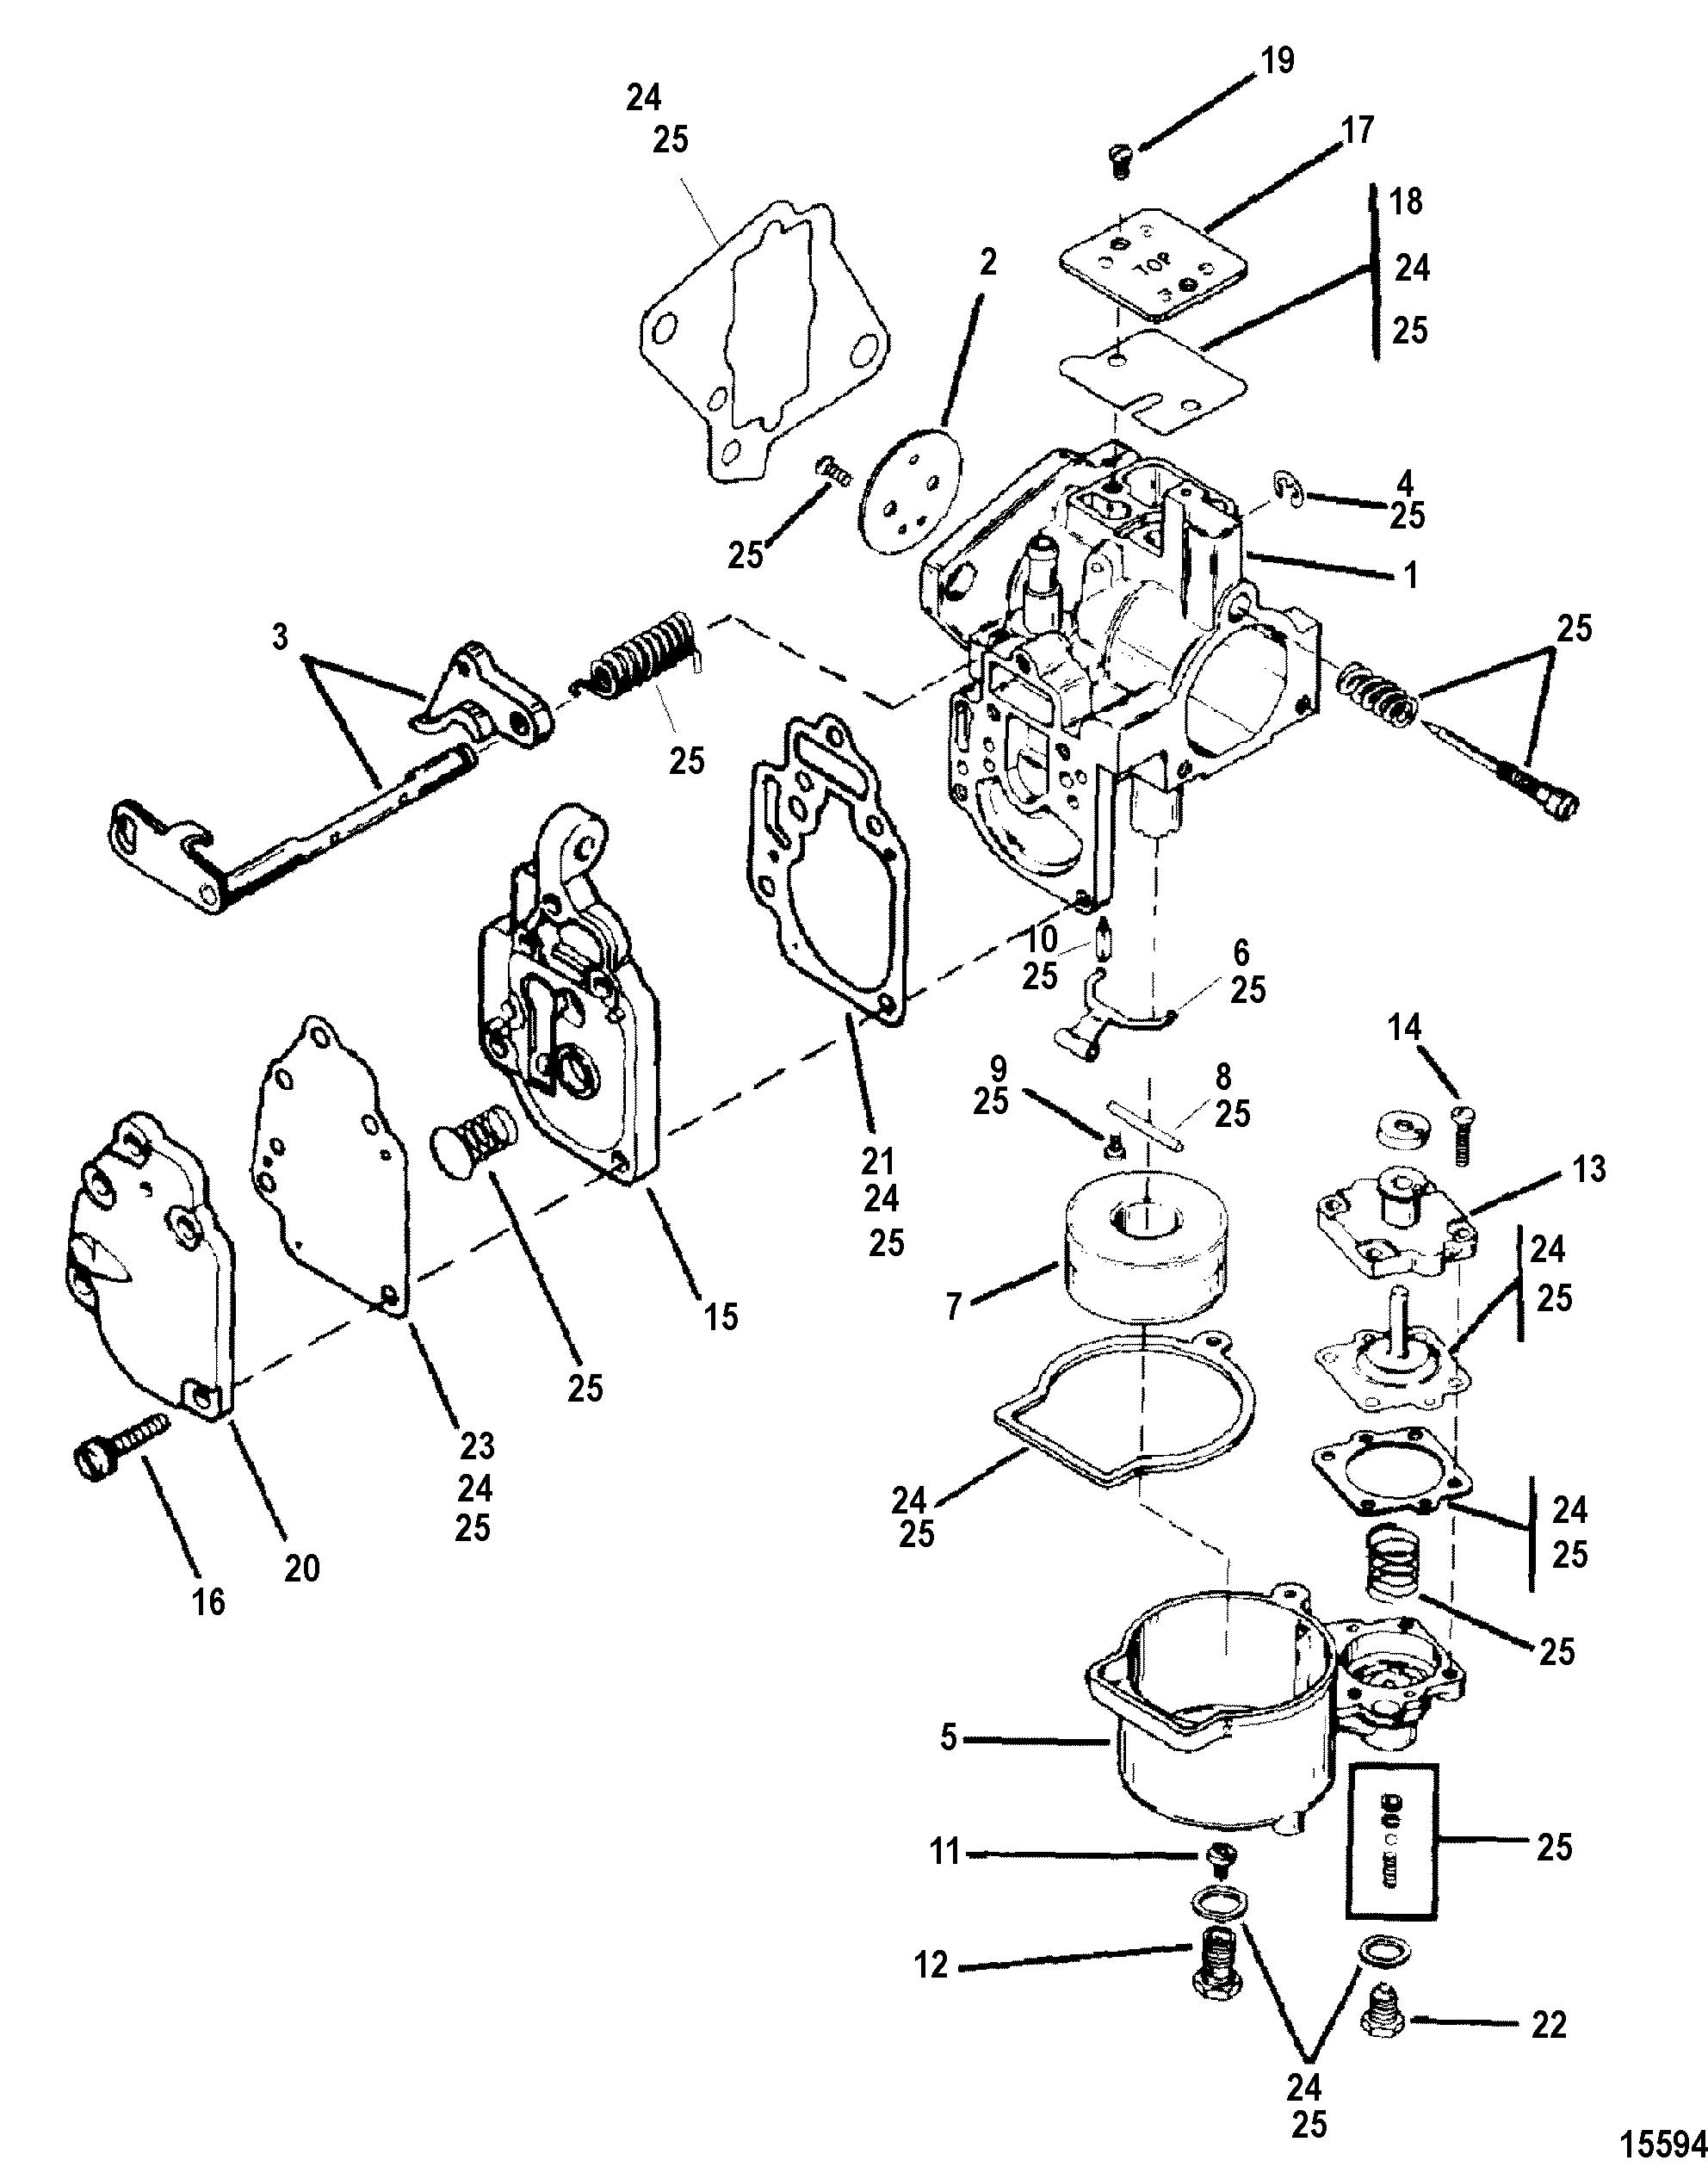 Carburetor Assembly For Mariner Mercury 8 9 9 13 5 15 2